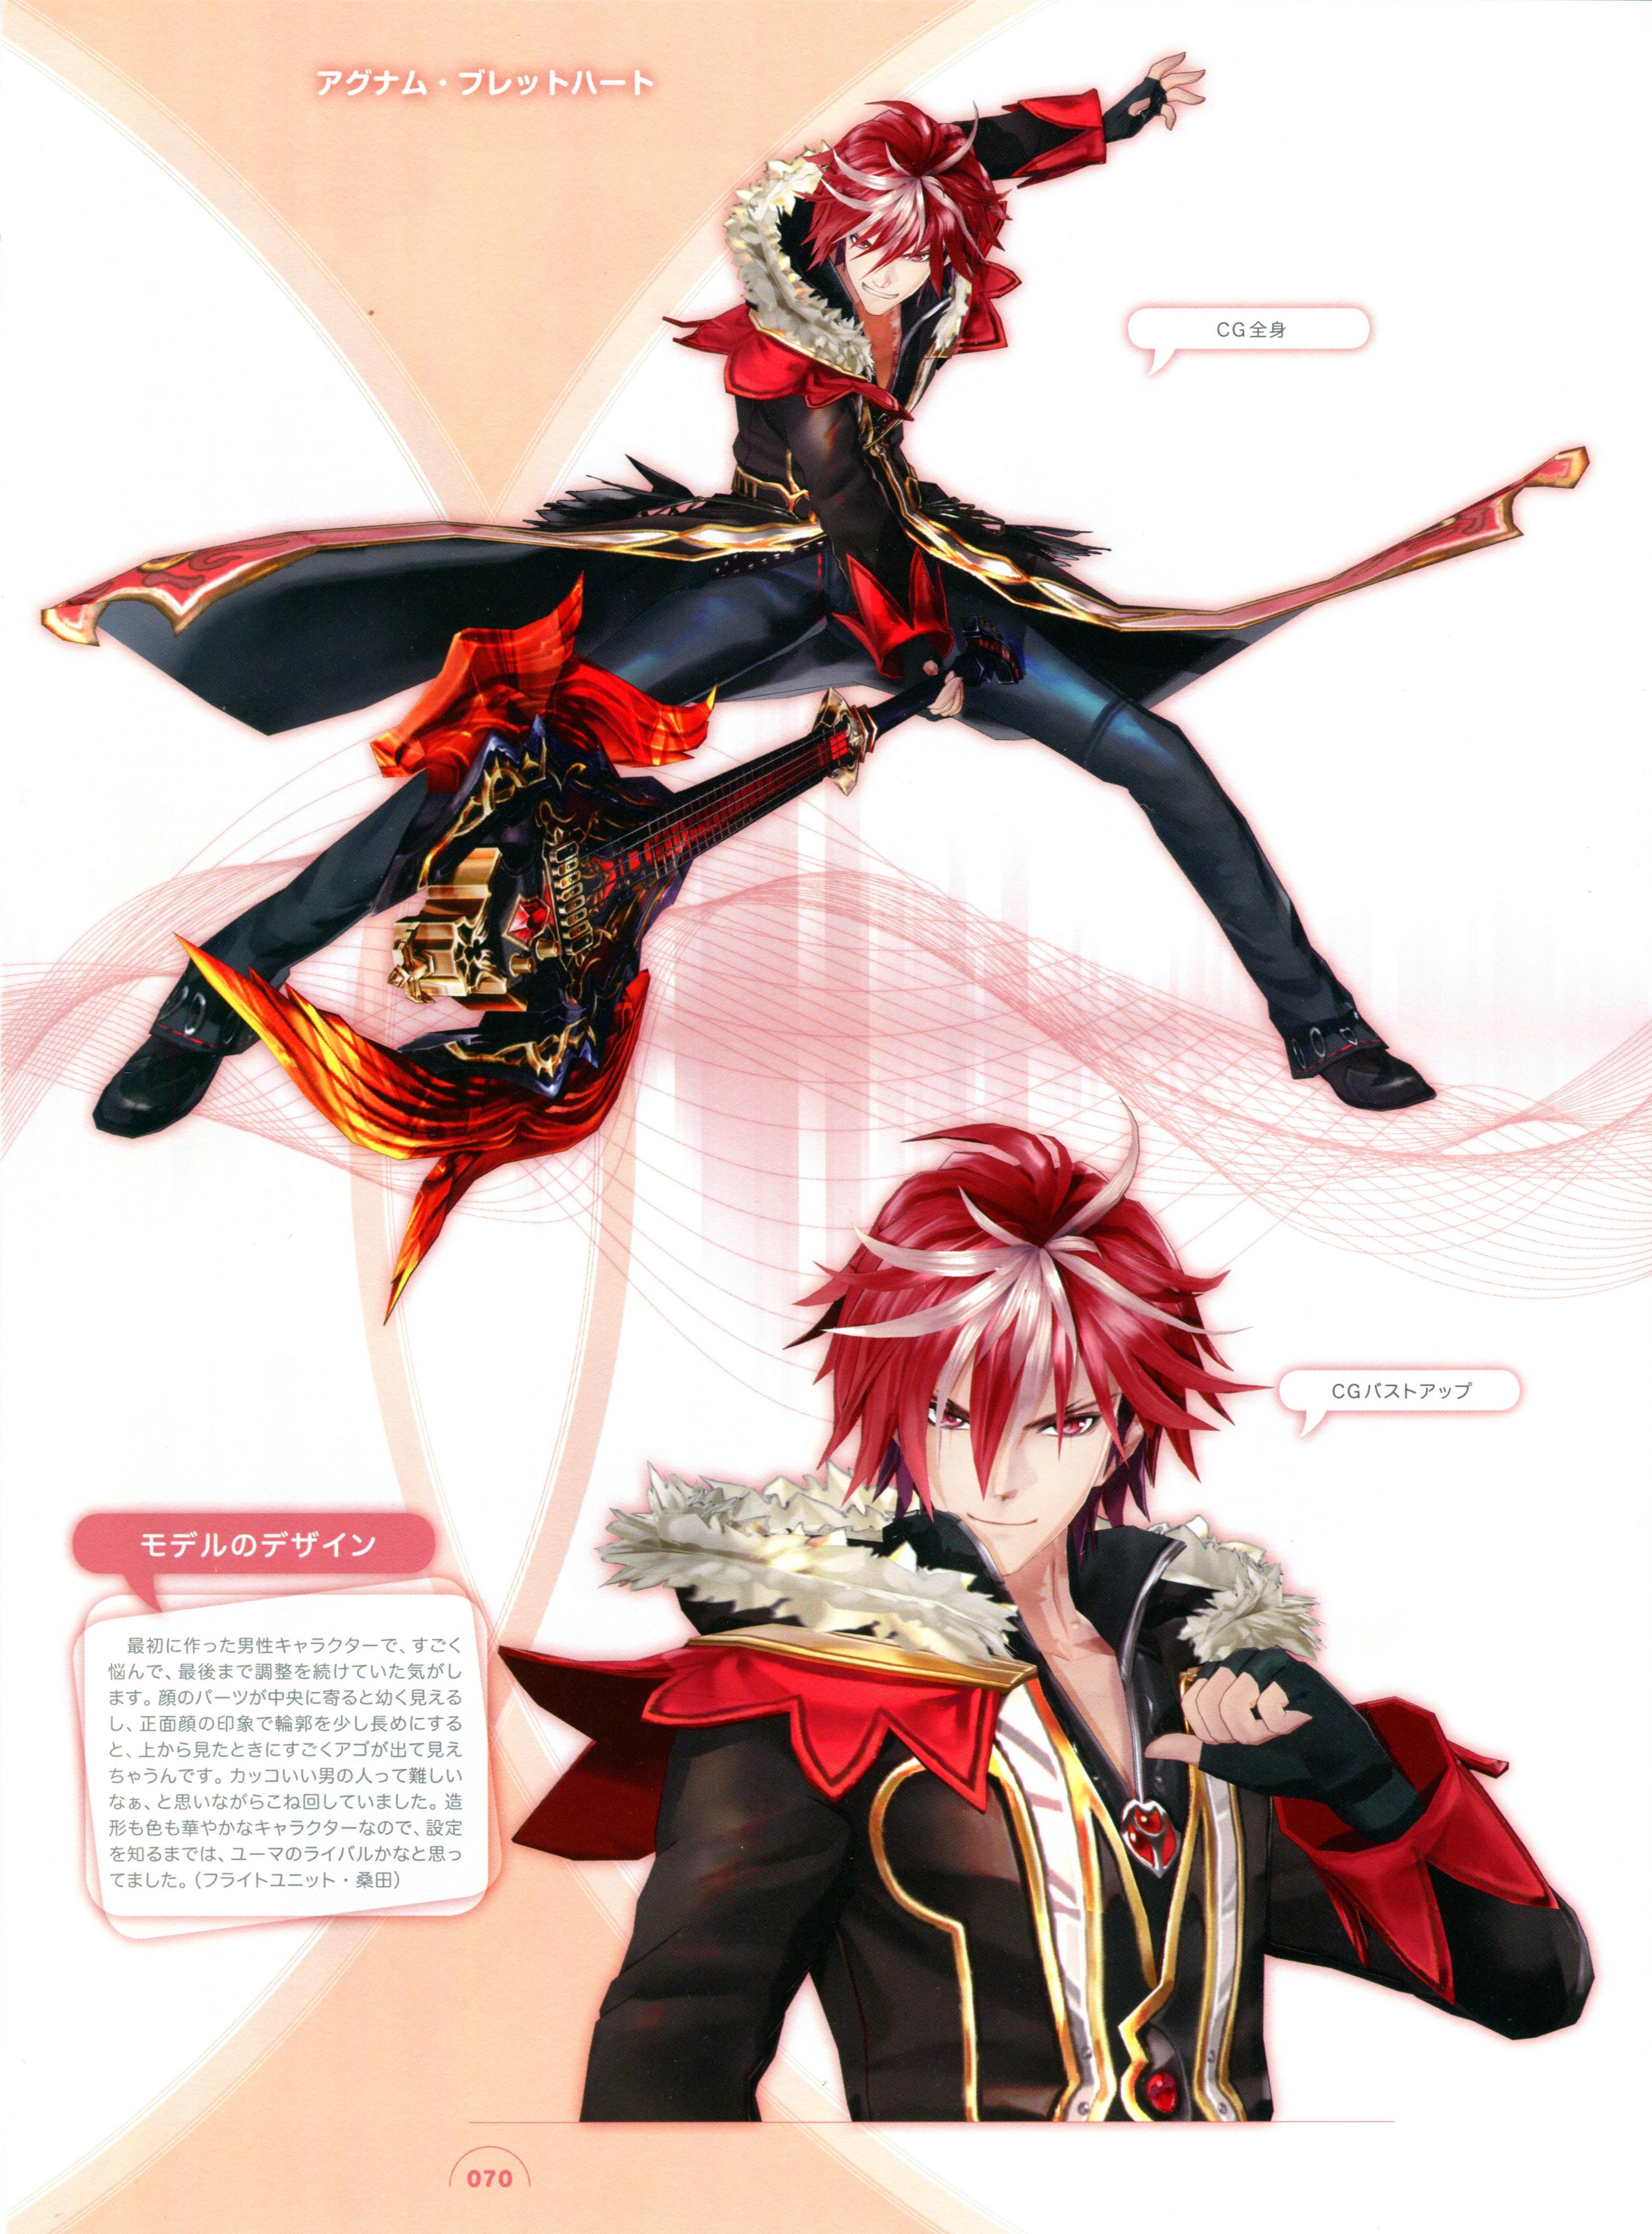 Favorie Fictional Characters __agnum_bulletheart_shining_resonance_and_etc_drawn_by_tanaka_takayuki__880b719ed3144757a47264cfa8c85388